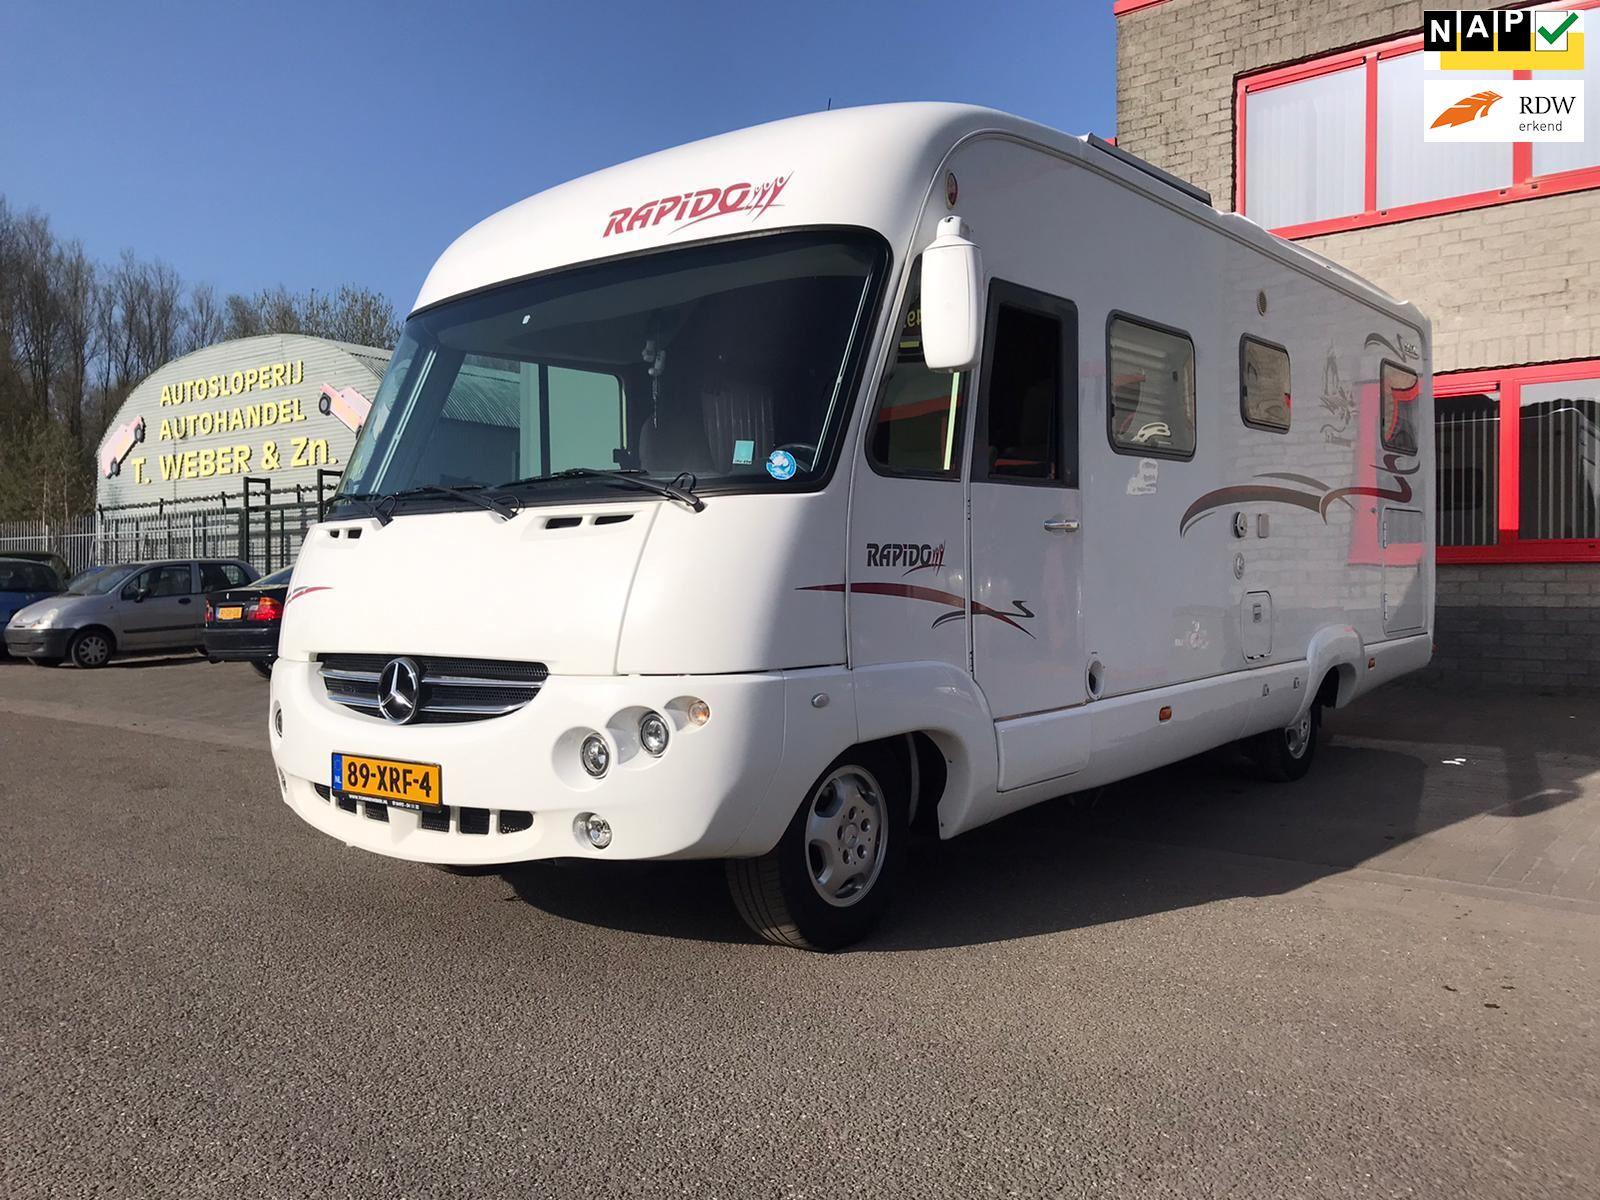 Mercedes-Benz Sprinter occasion - Autobedrijf Tommie Weber & zn.